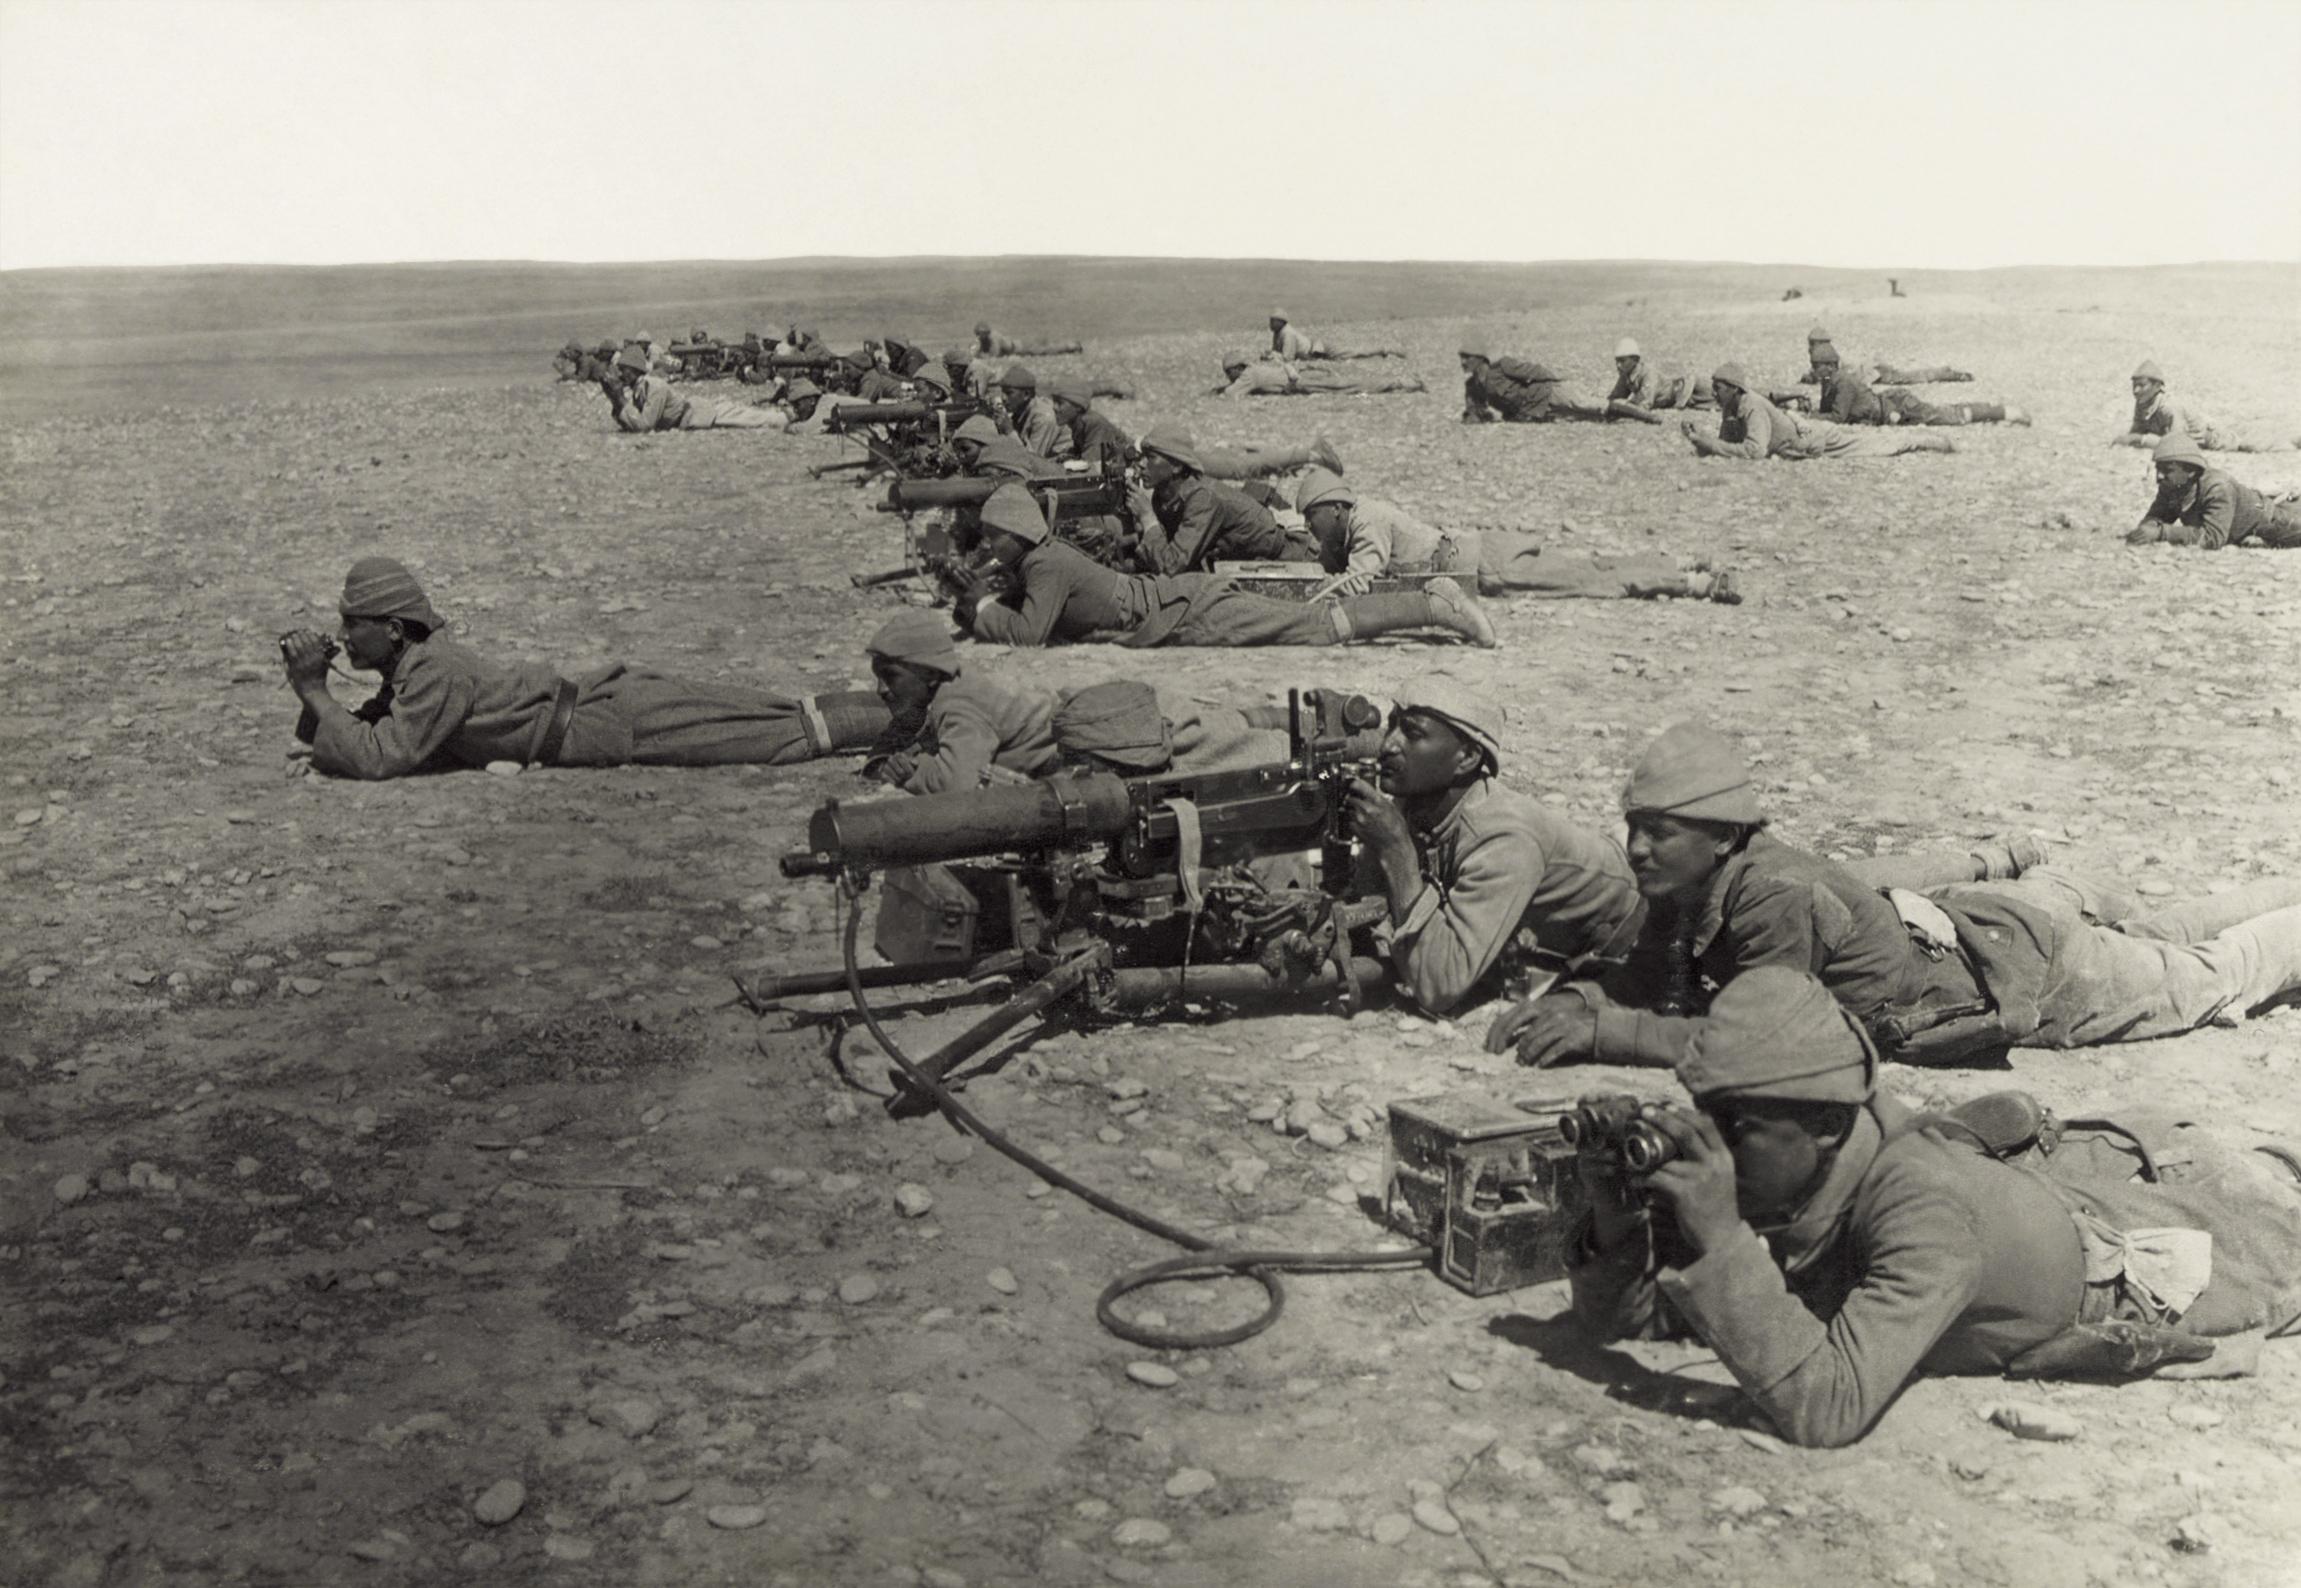 Machine_gun_corps_Gaza_line_WWIb_edit2.jpg